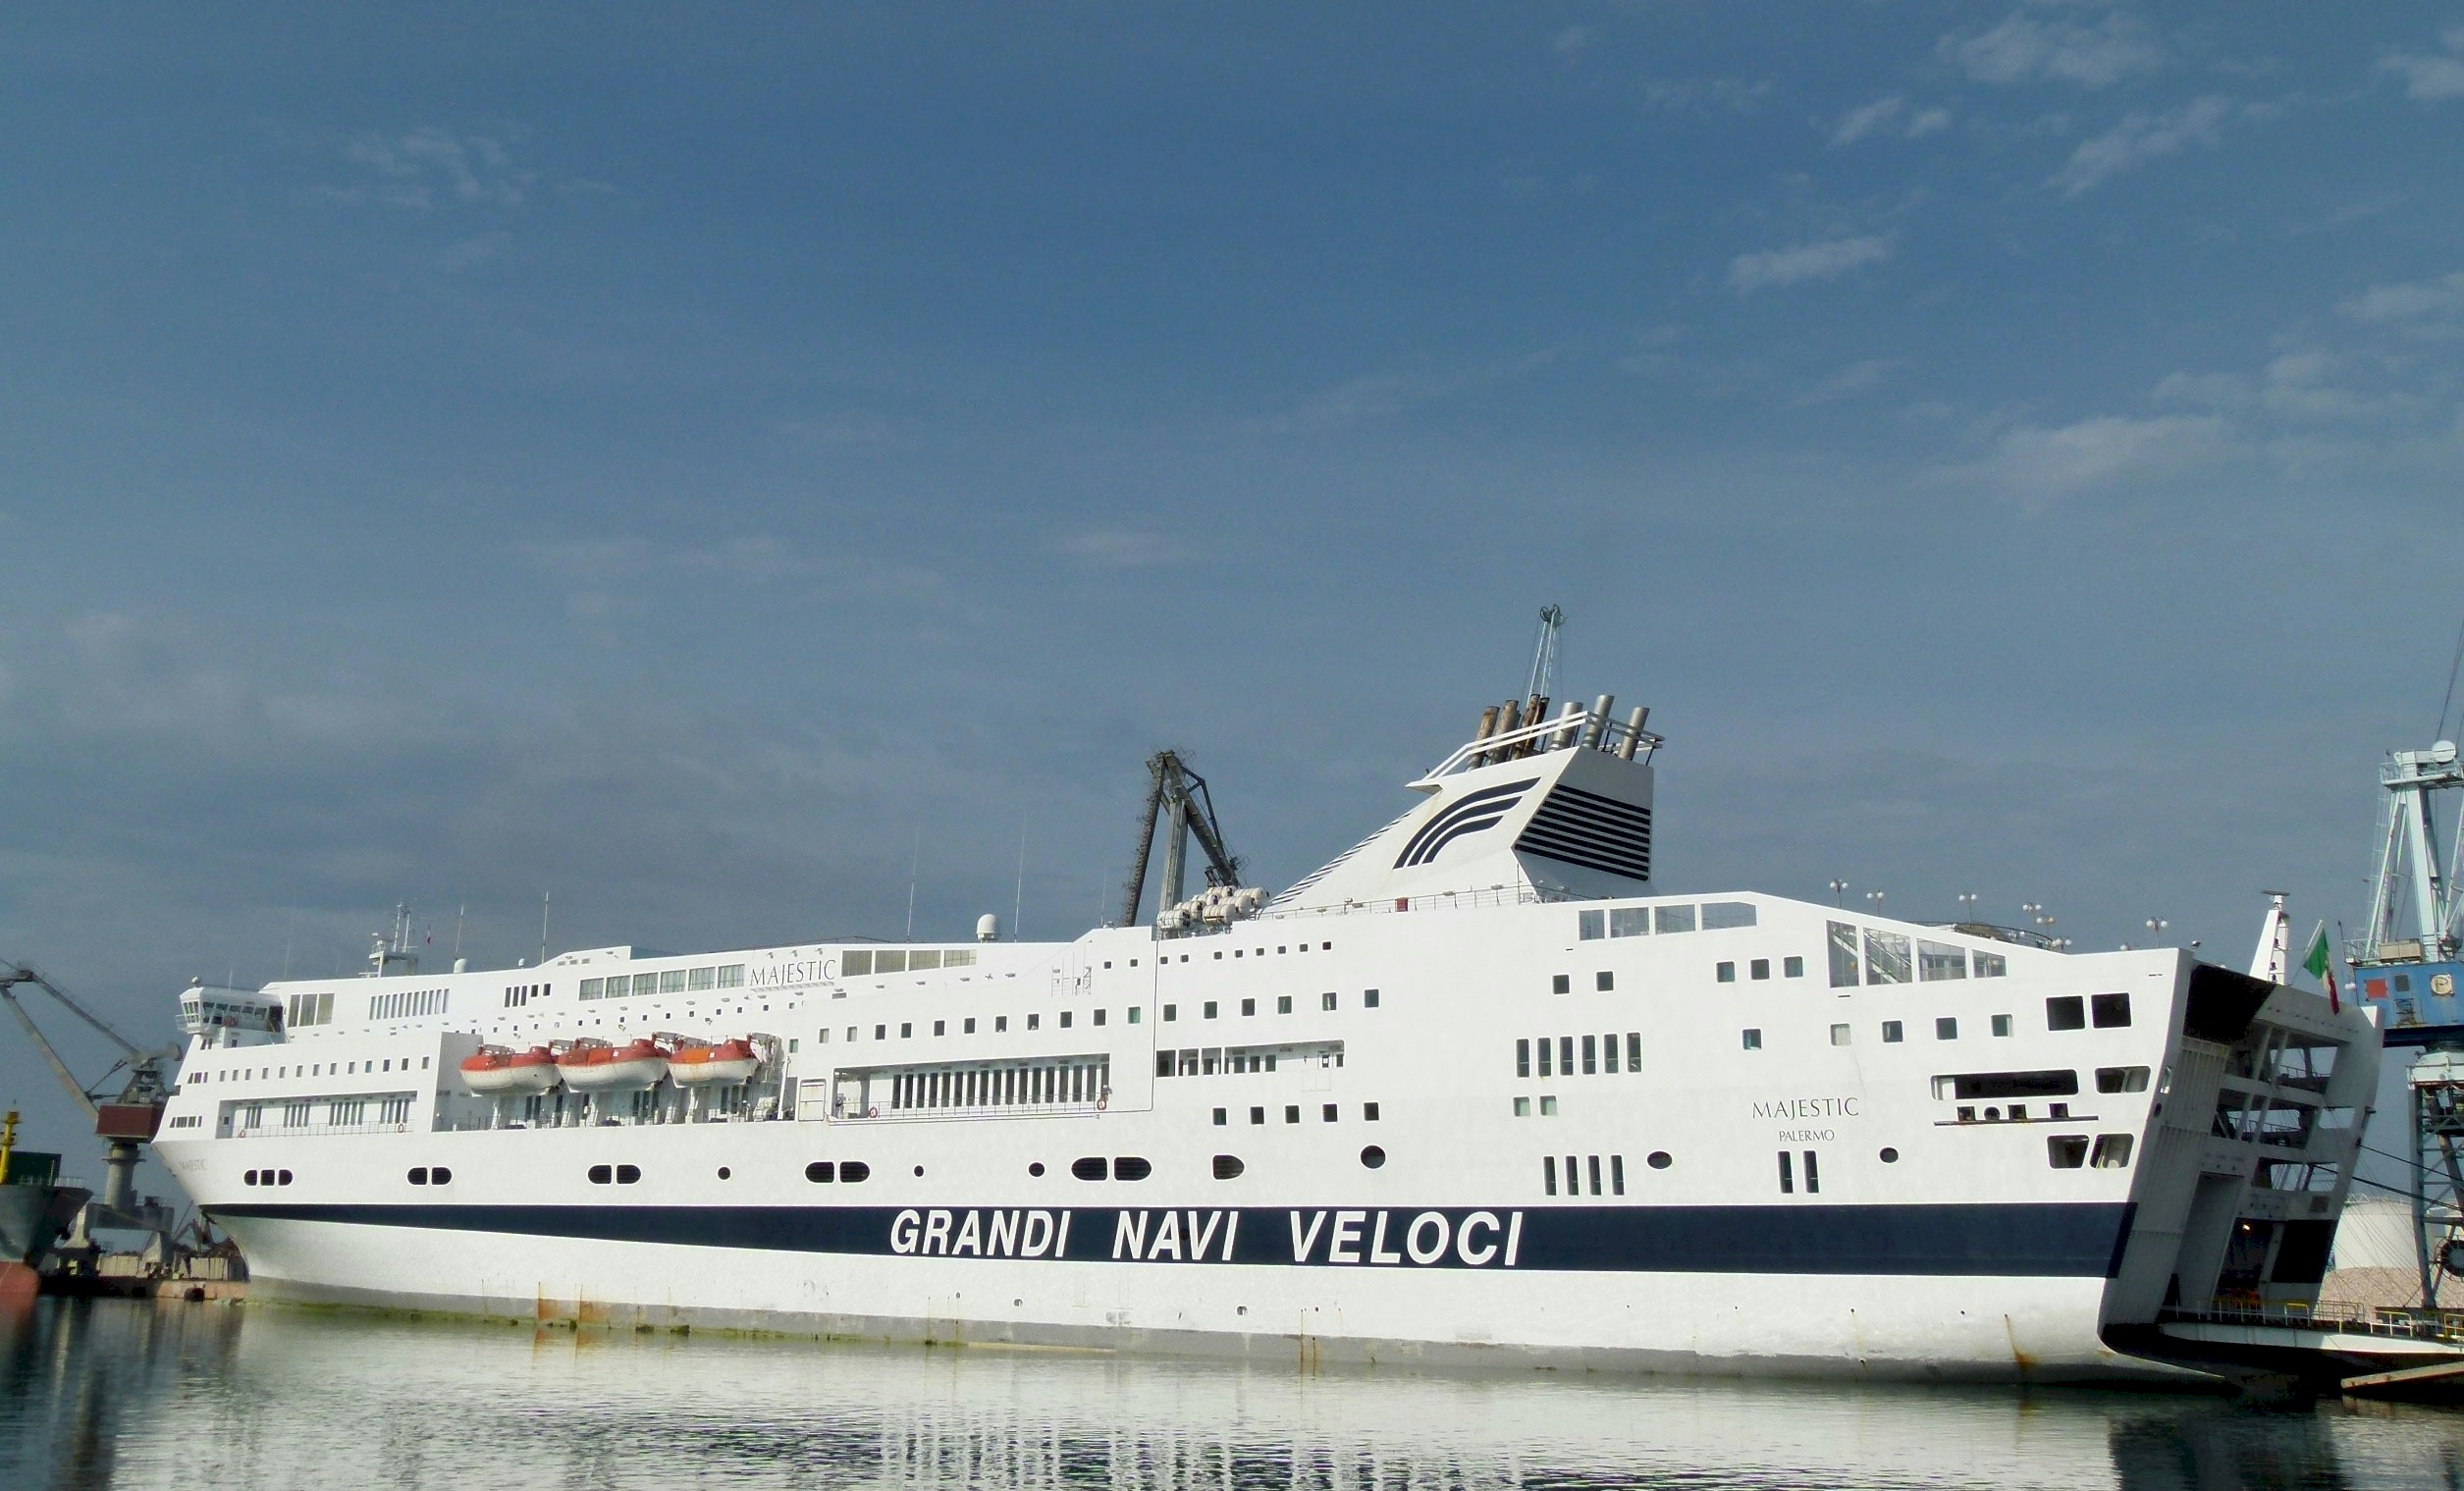 grandi-navi-feloci-majestic-ferry-boat